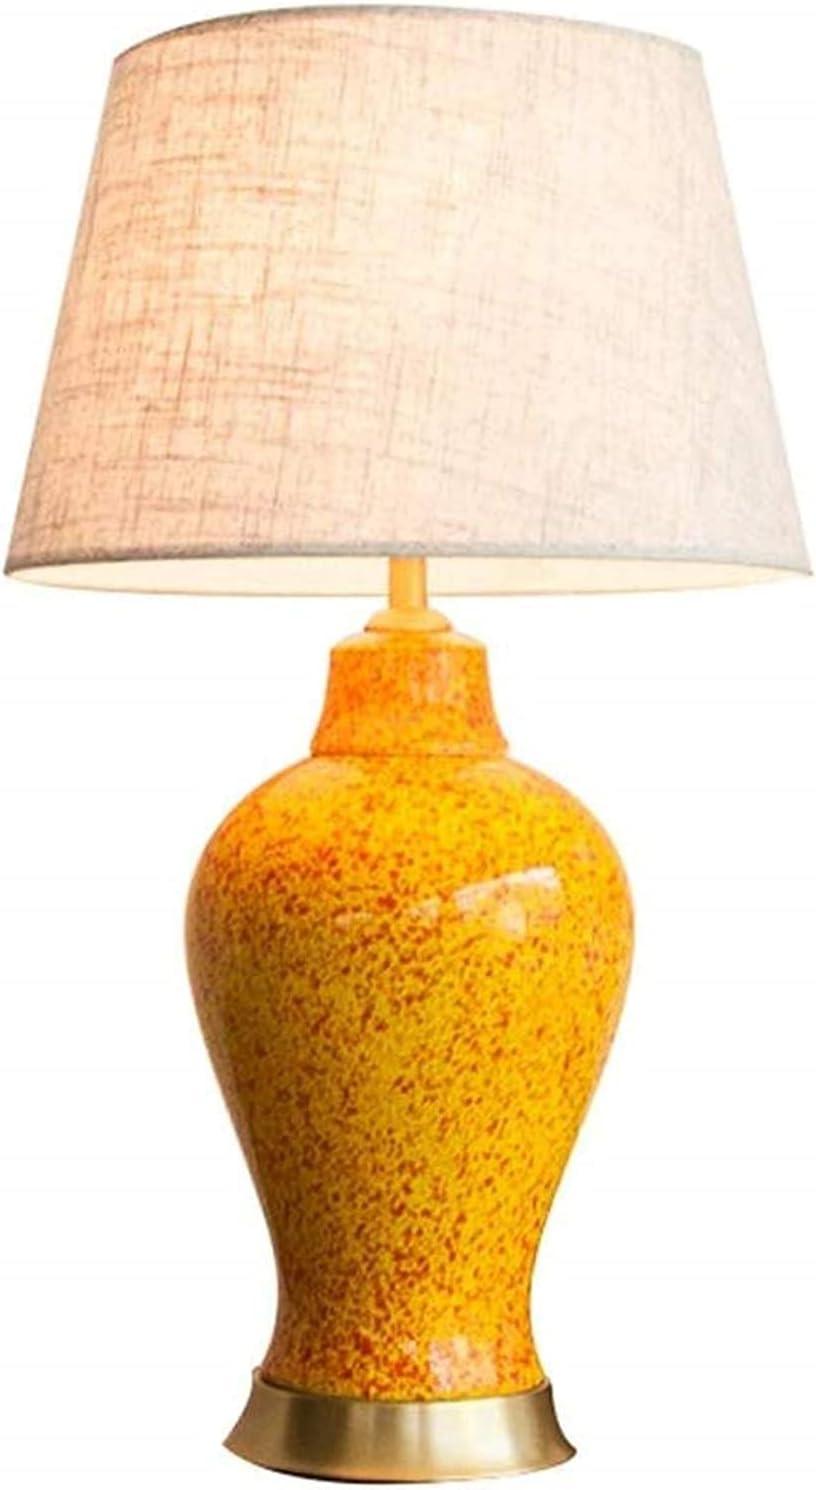 XFXDBT Nightstand Lamp Bedroom 2021 model Lamps Ceramic Table Yellow Super Special SALE held E